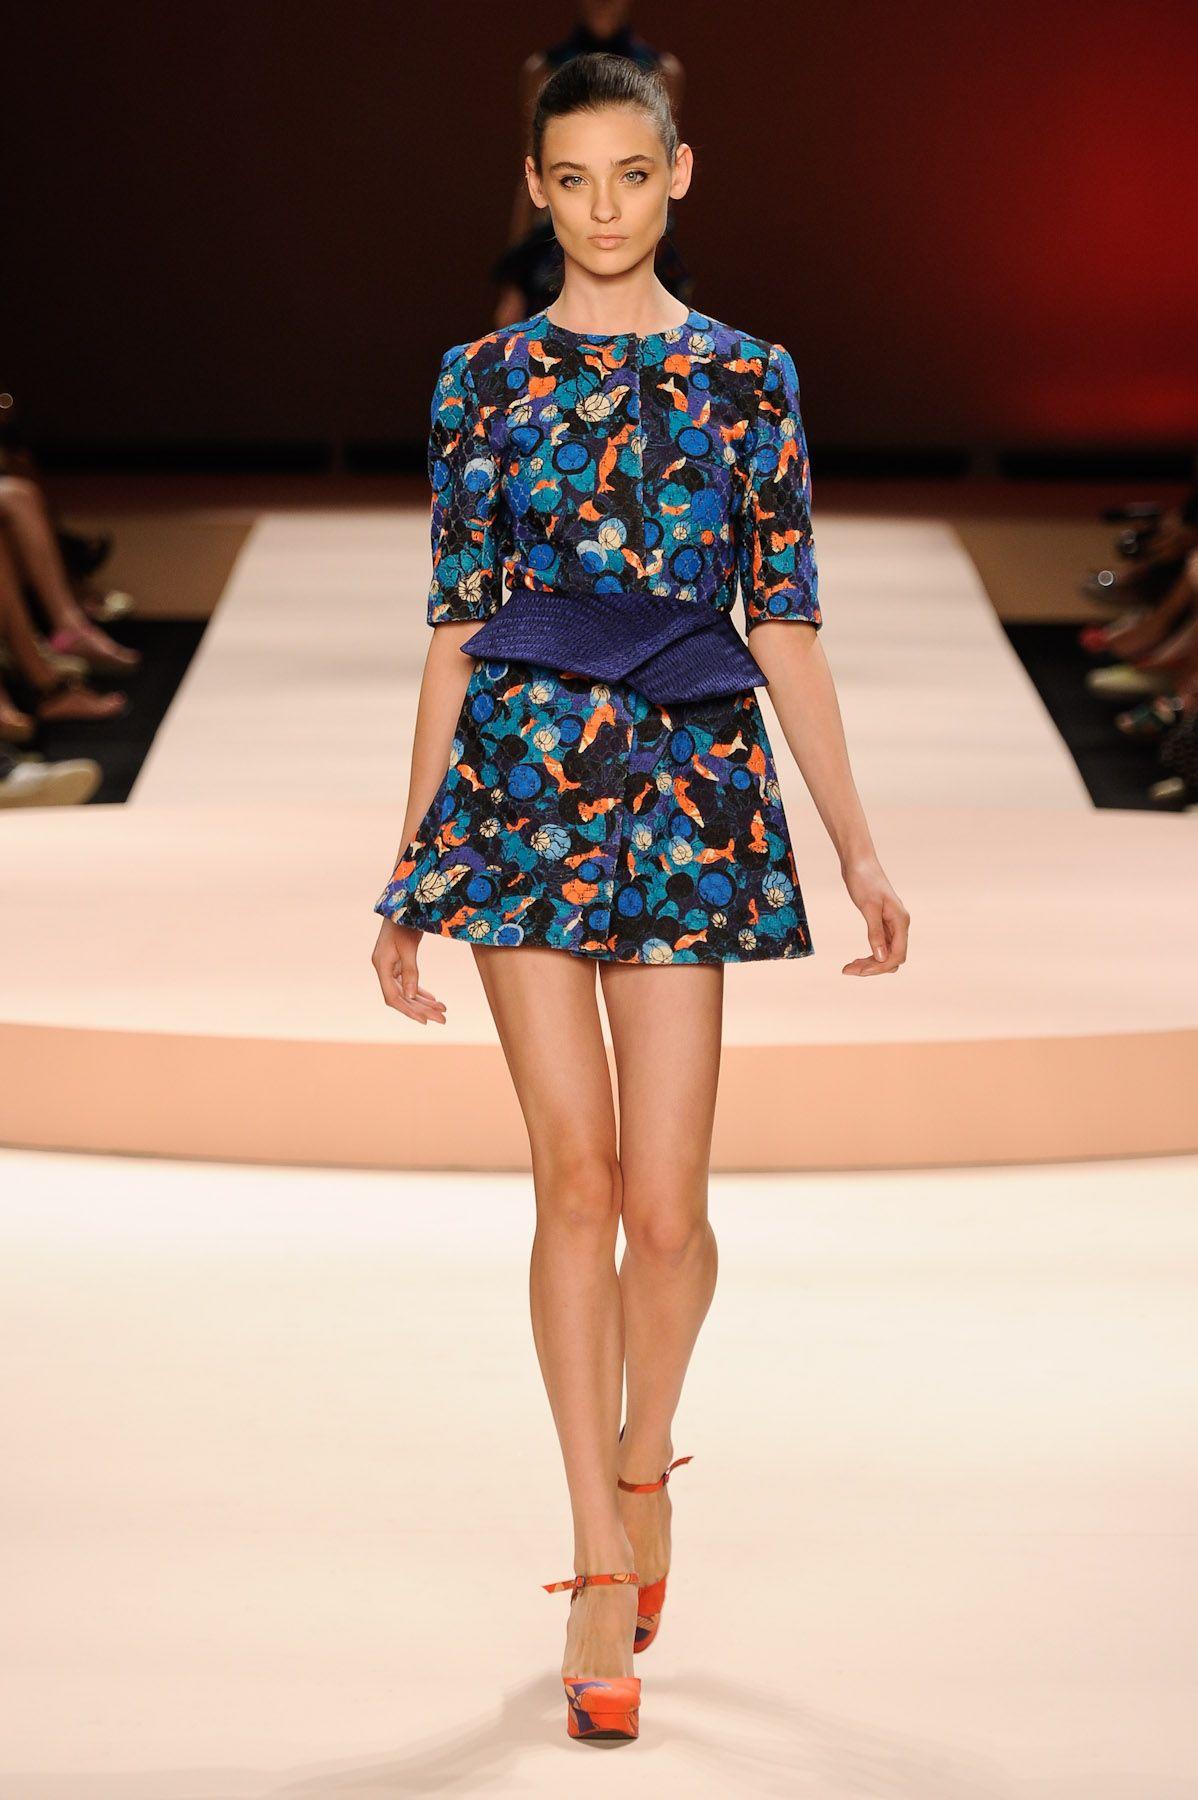 ad01c5172 Maria Bonita Extra Catwalk Fashion, Rio, Brazil, Winter Collection,  Walkways, Hair